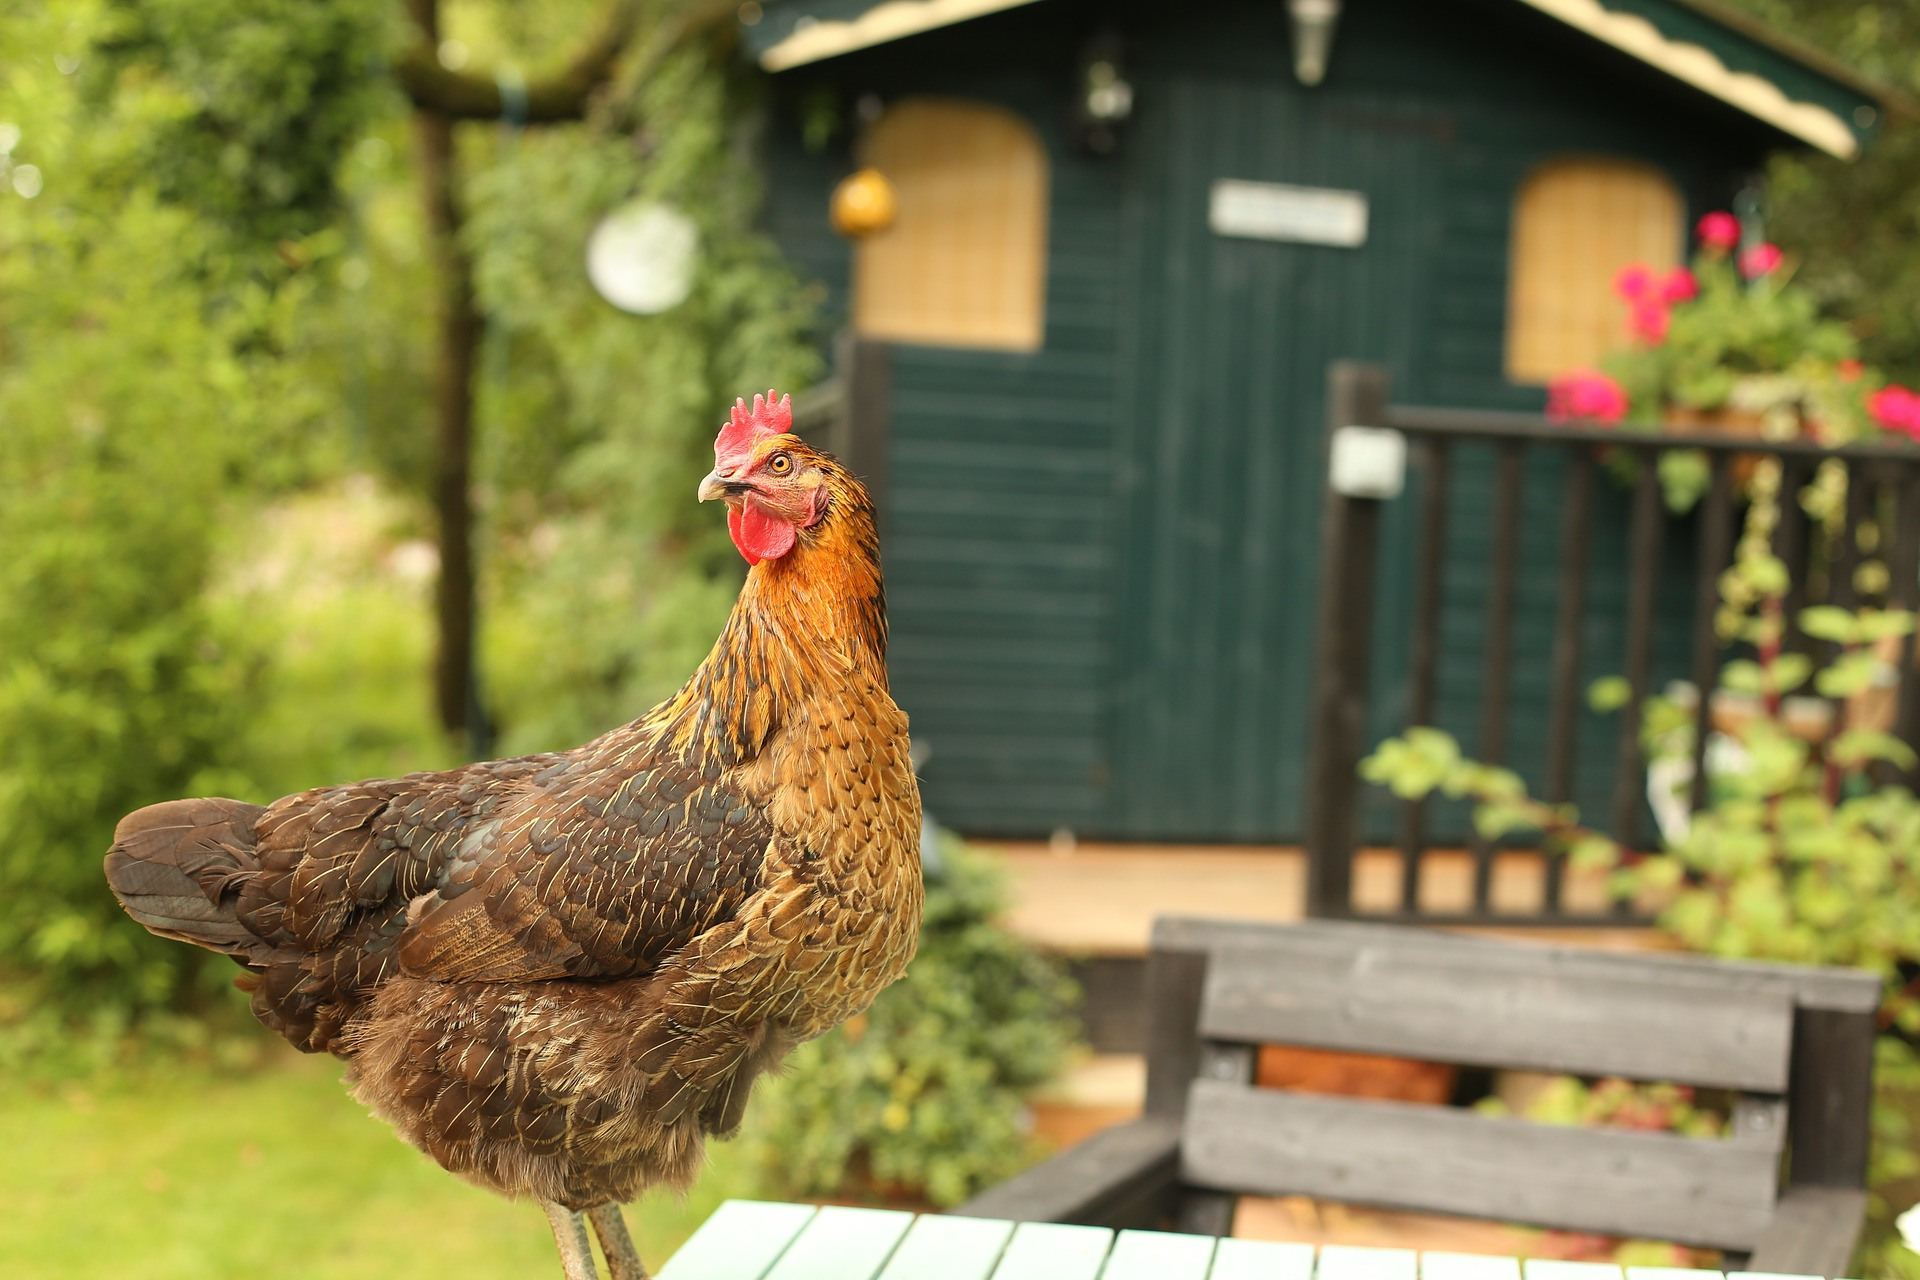 backyard chickens approved in wausau u2013 wausau pilot u0026 review